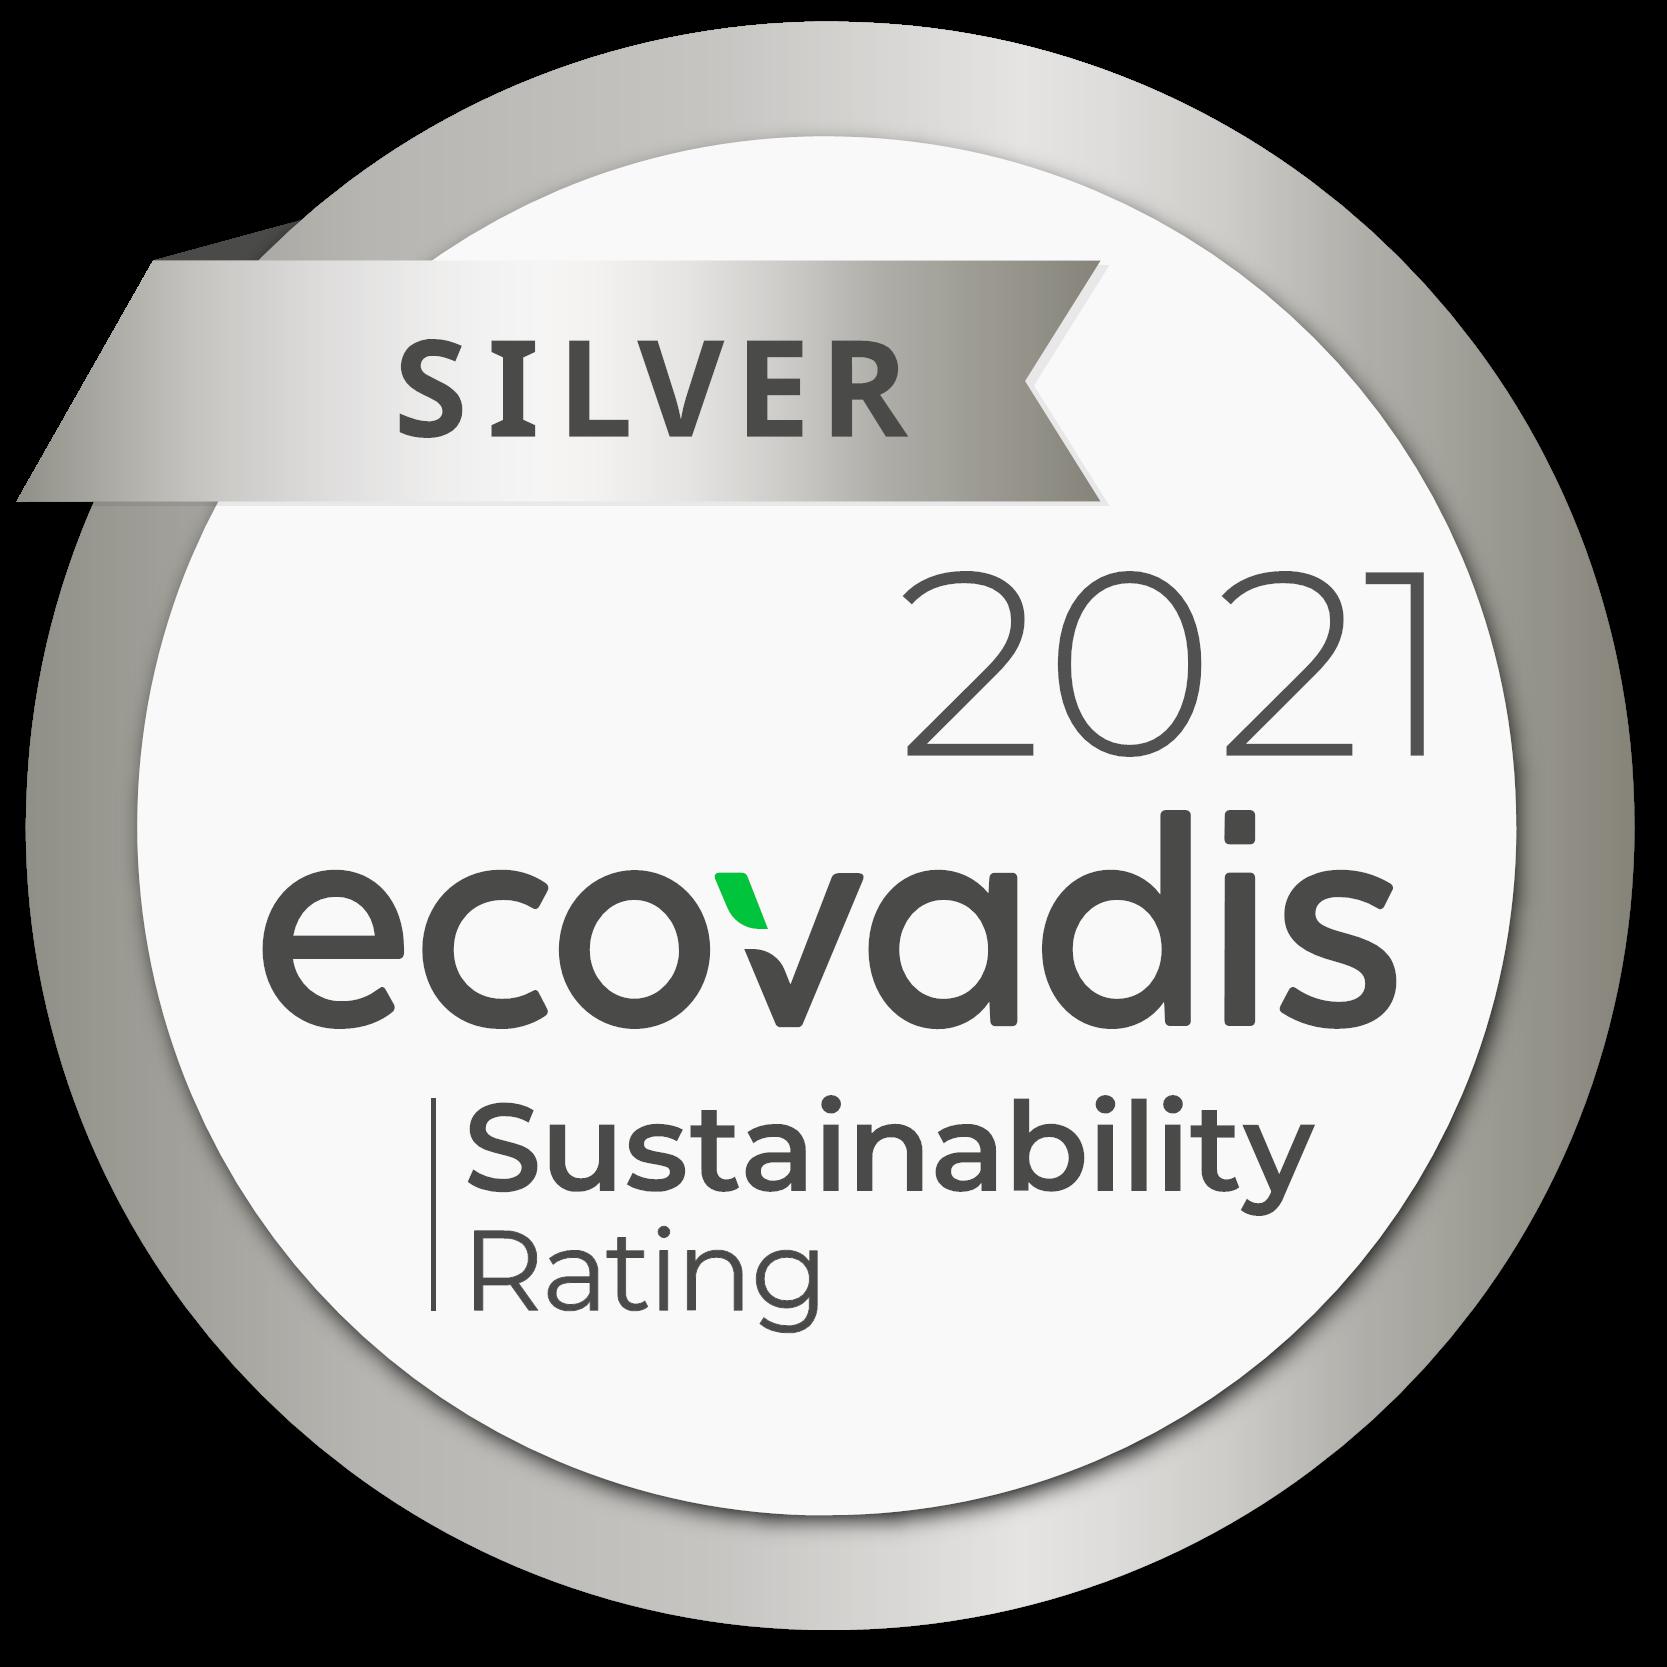 Médaille silver Ecovadis 2021